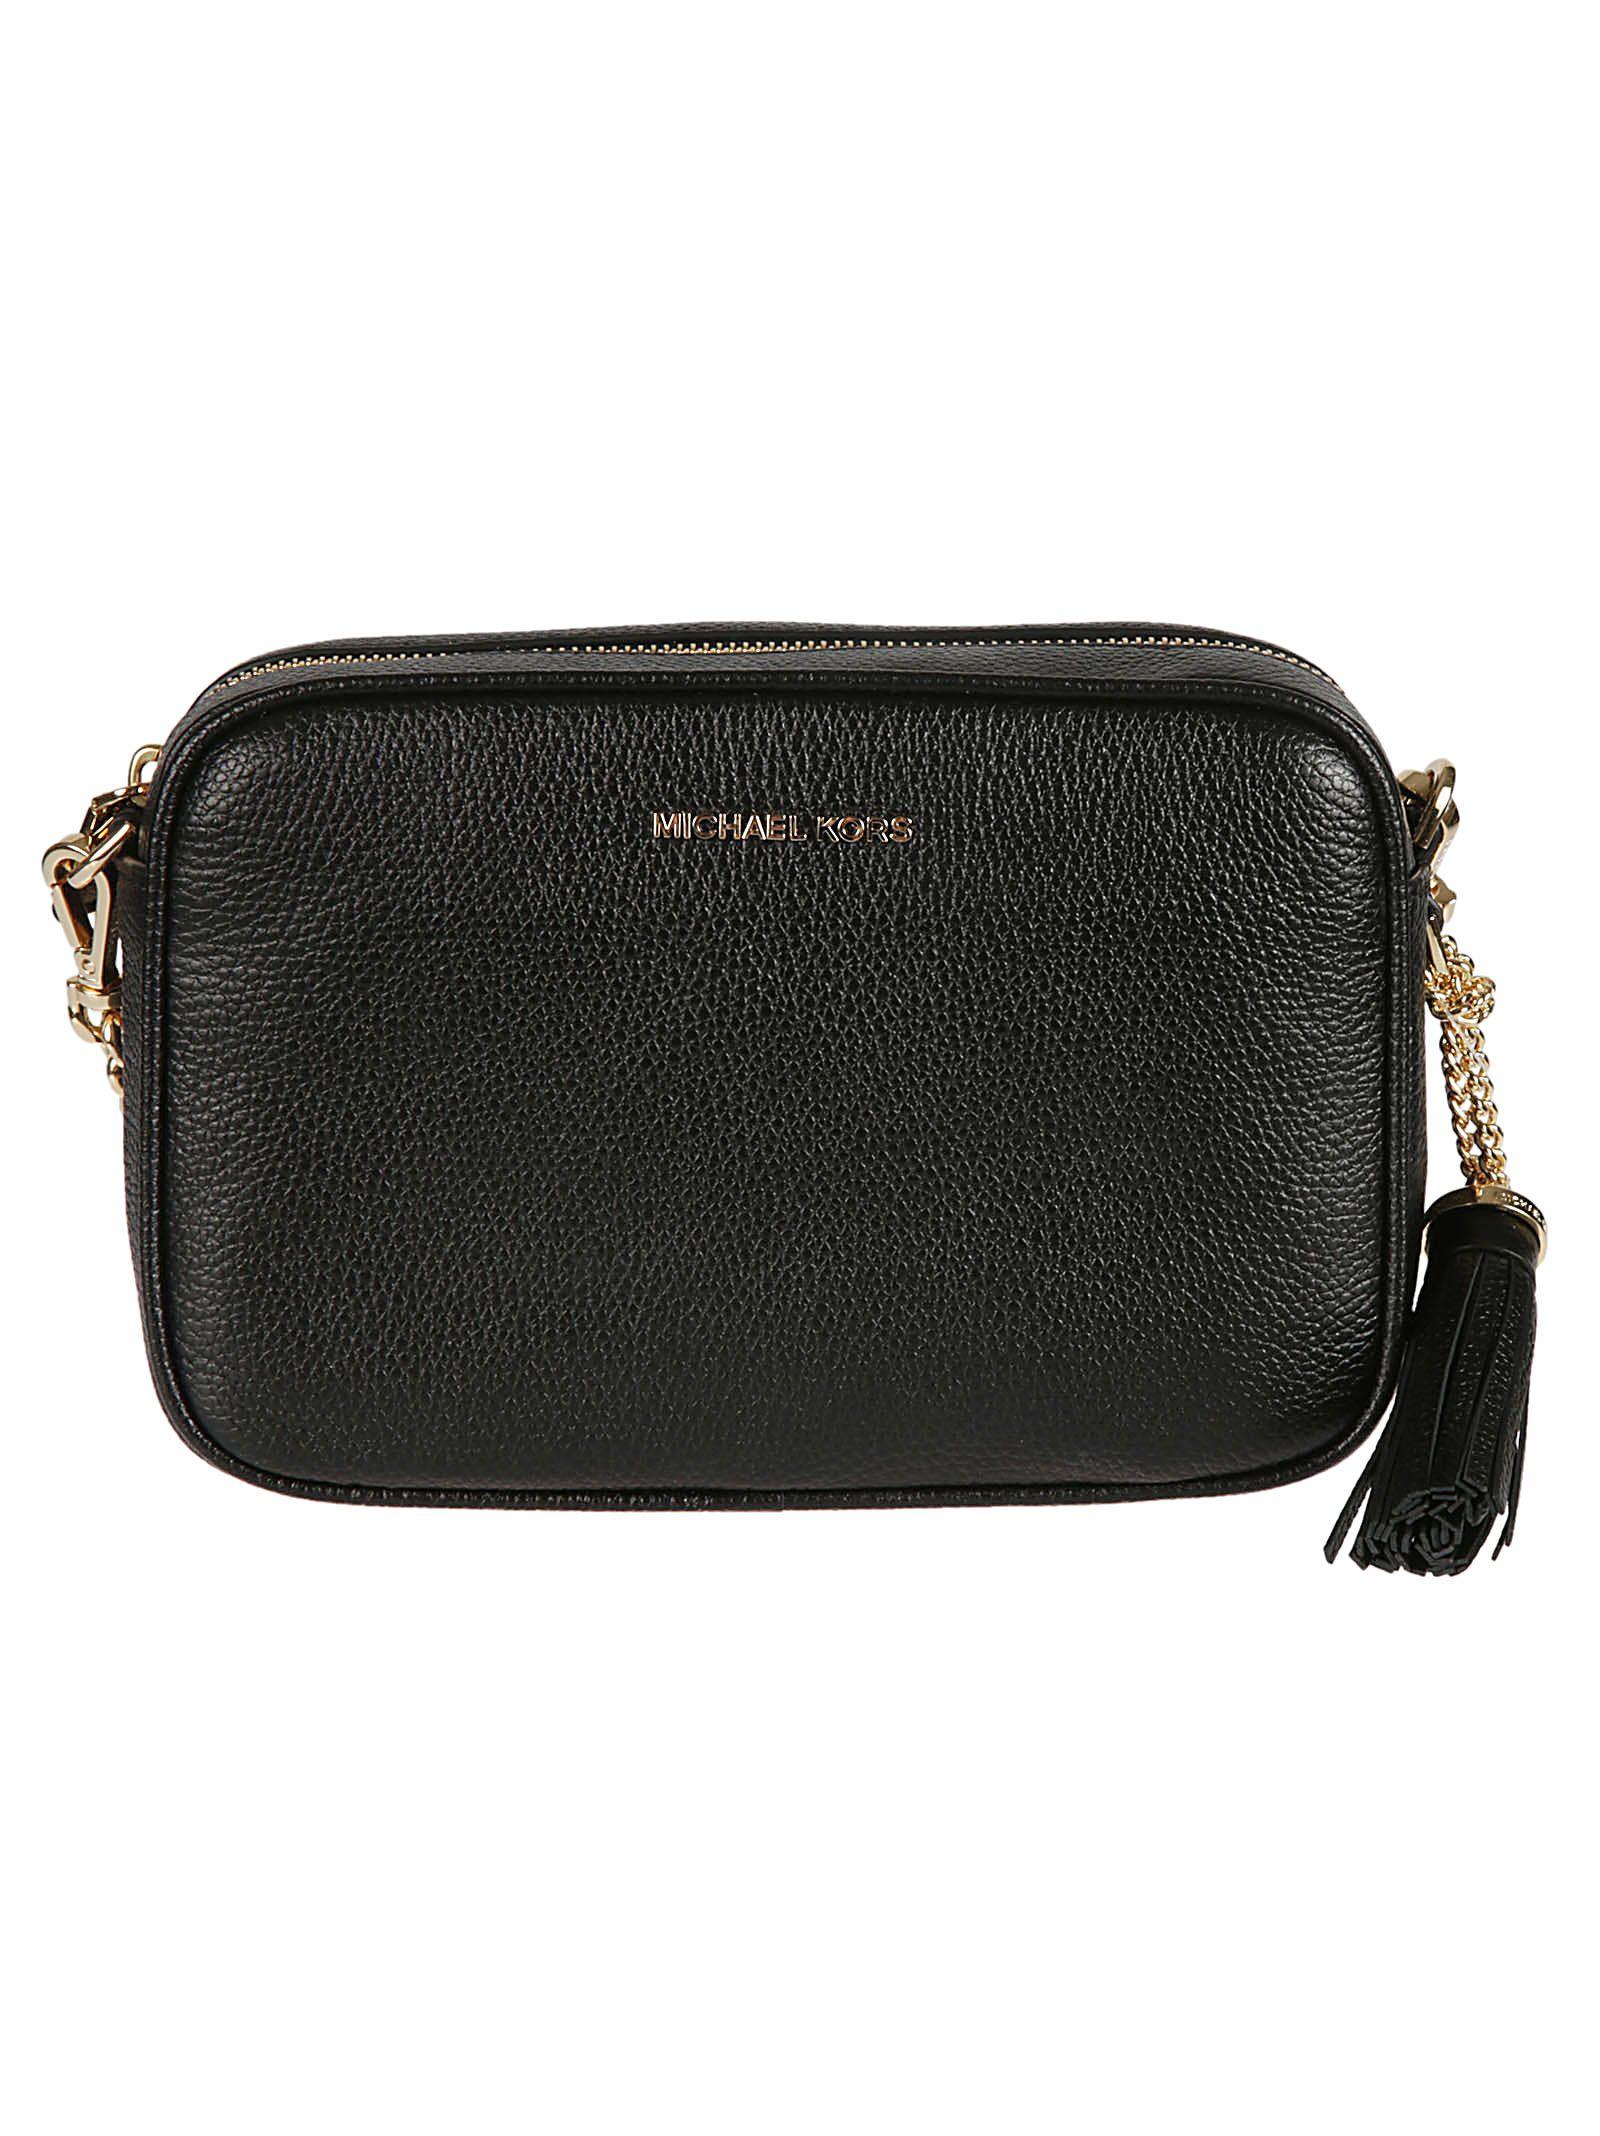 c0c7f7d93d2f9 Michael Kors Michael Kors Ginny Crossbody Bag - Black - 10801906 ...